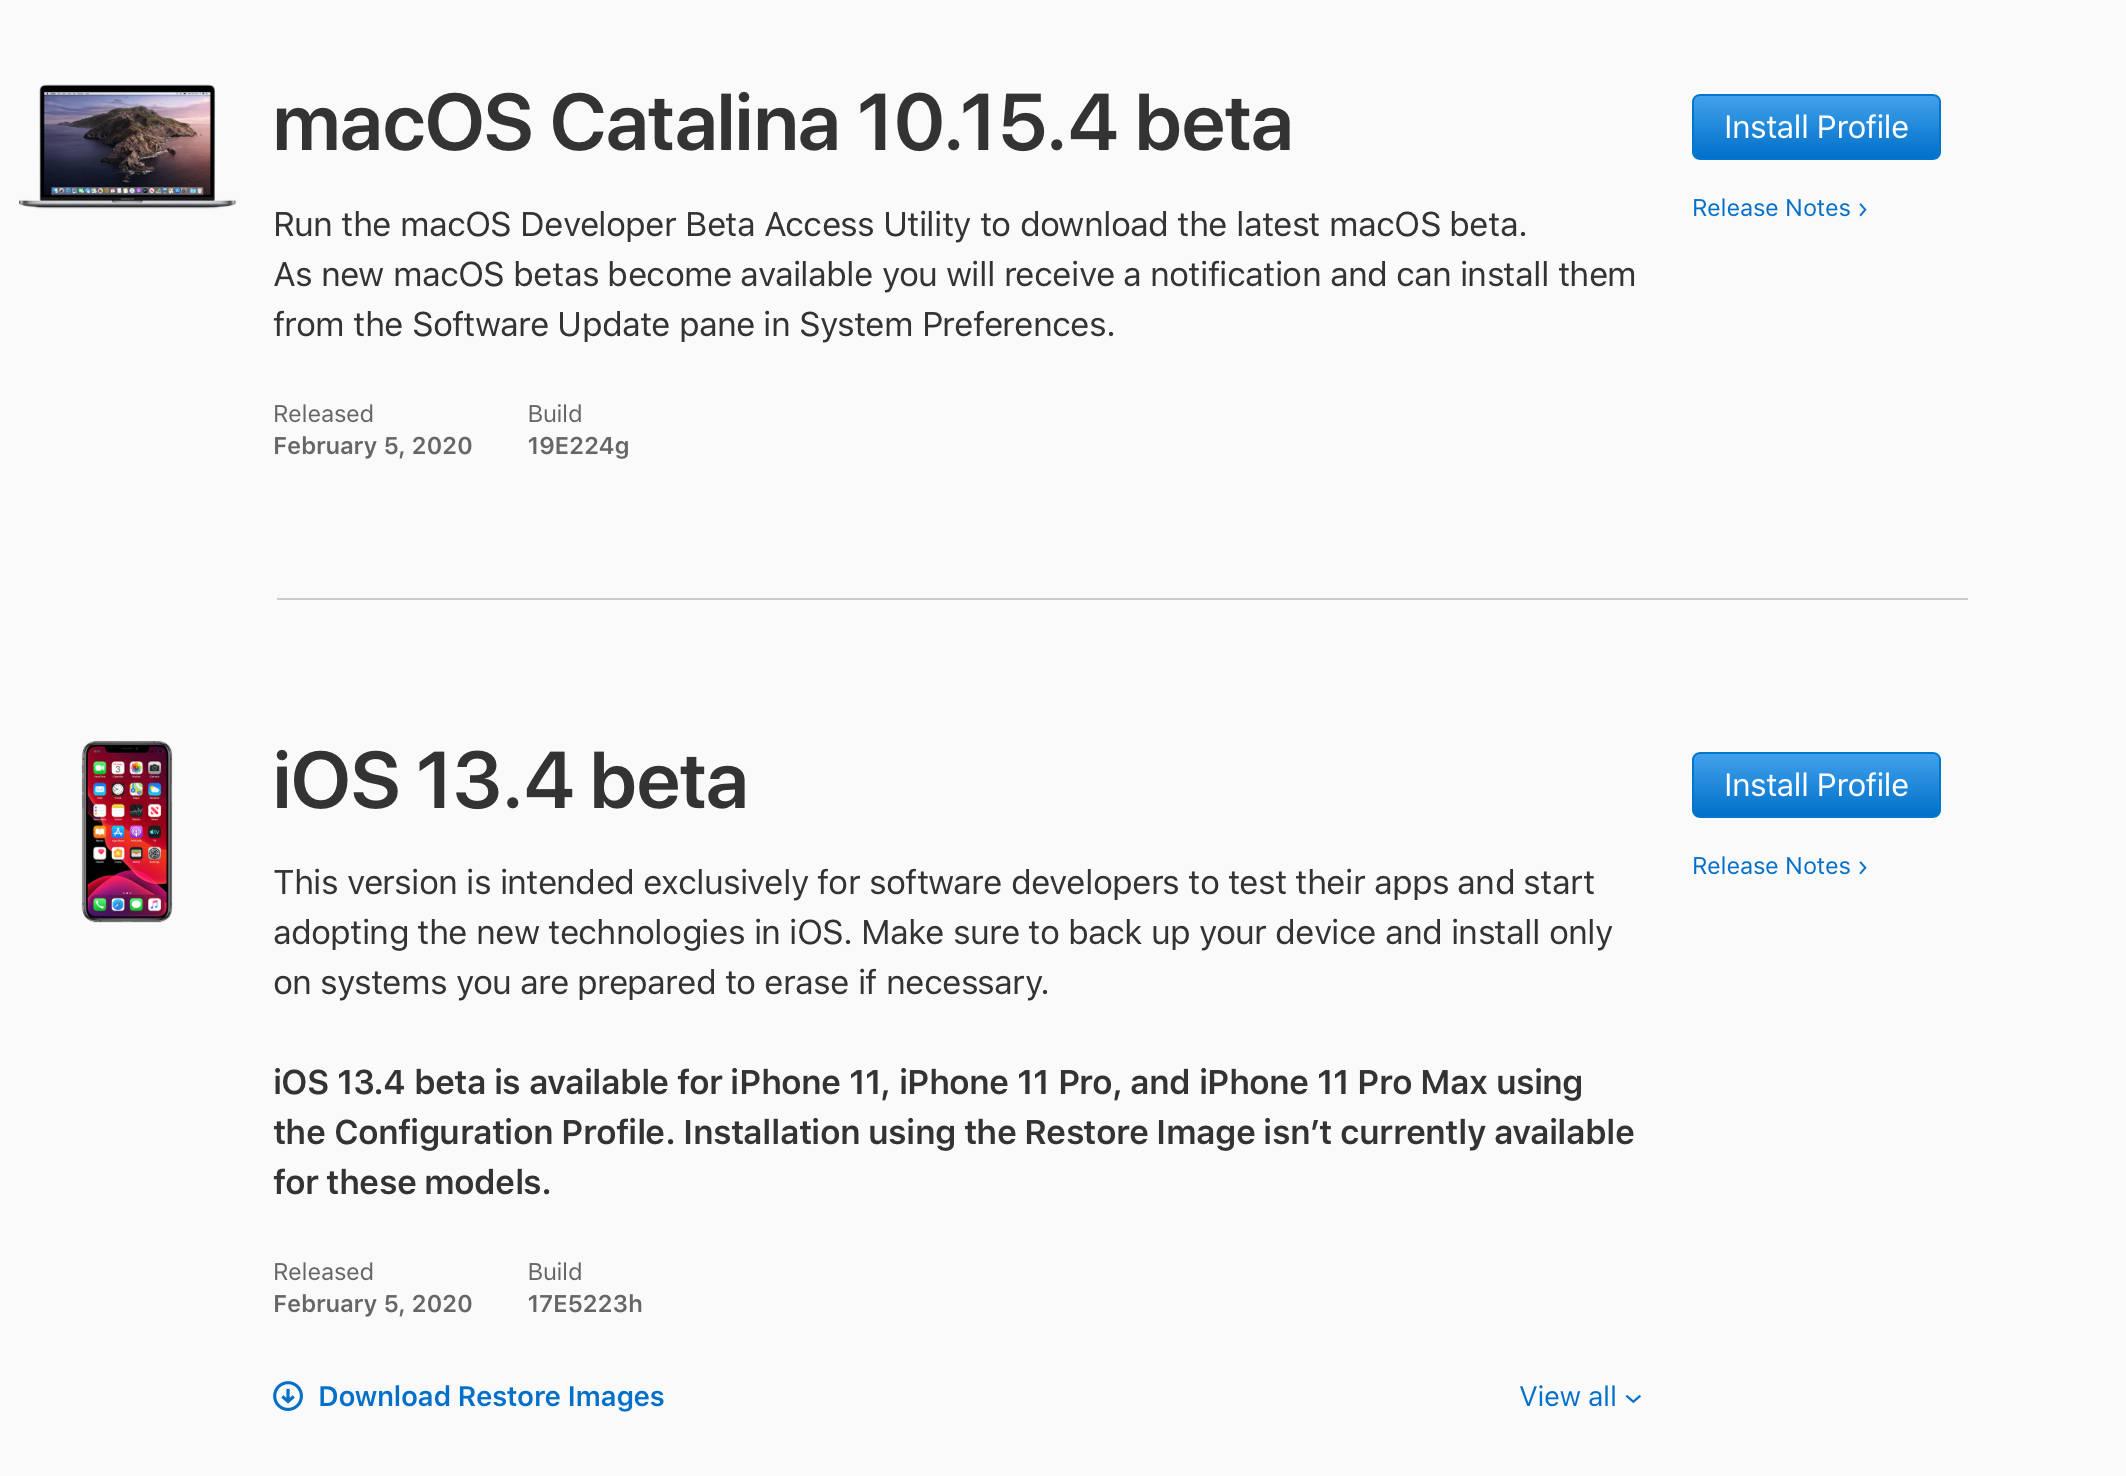 iOS 13.4 beta 1 Apple aktualizacja iPhone macOS 10.15.4 watchOS 6.2 rvOS 13.4 iPad OS 13.4